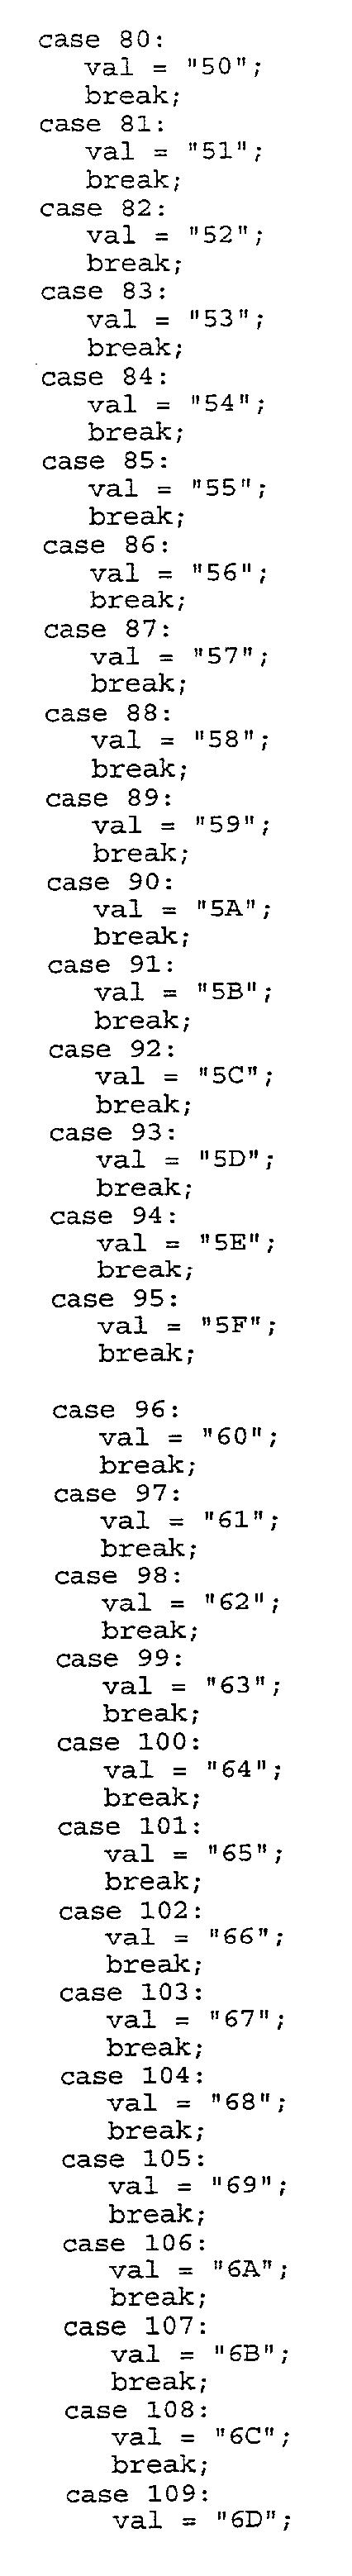 Figure US20020113824A1-20020822-P00155